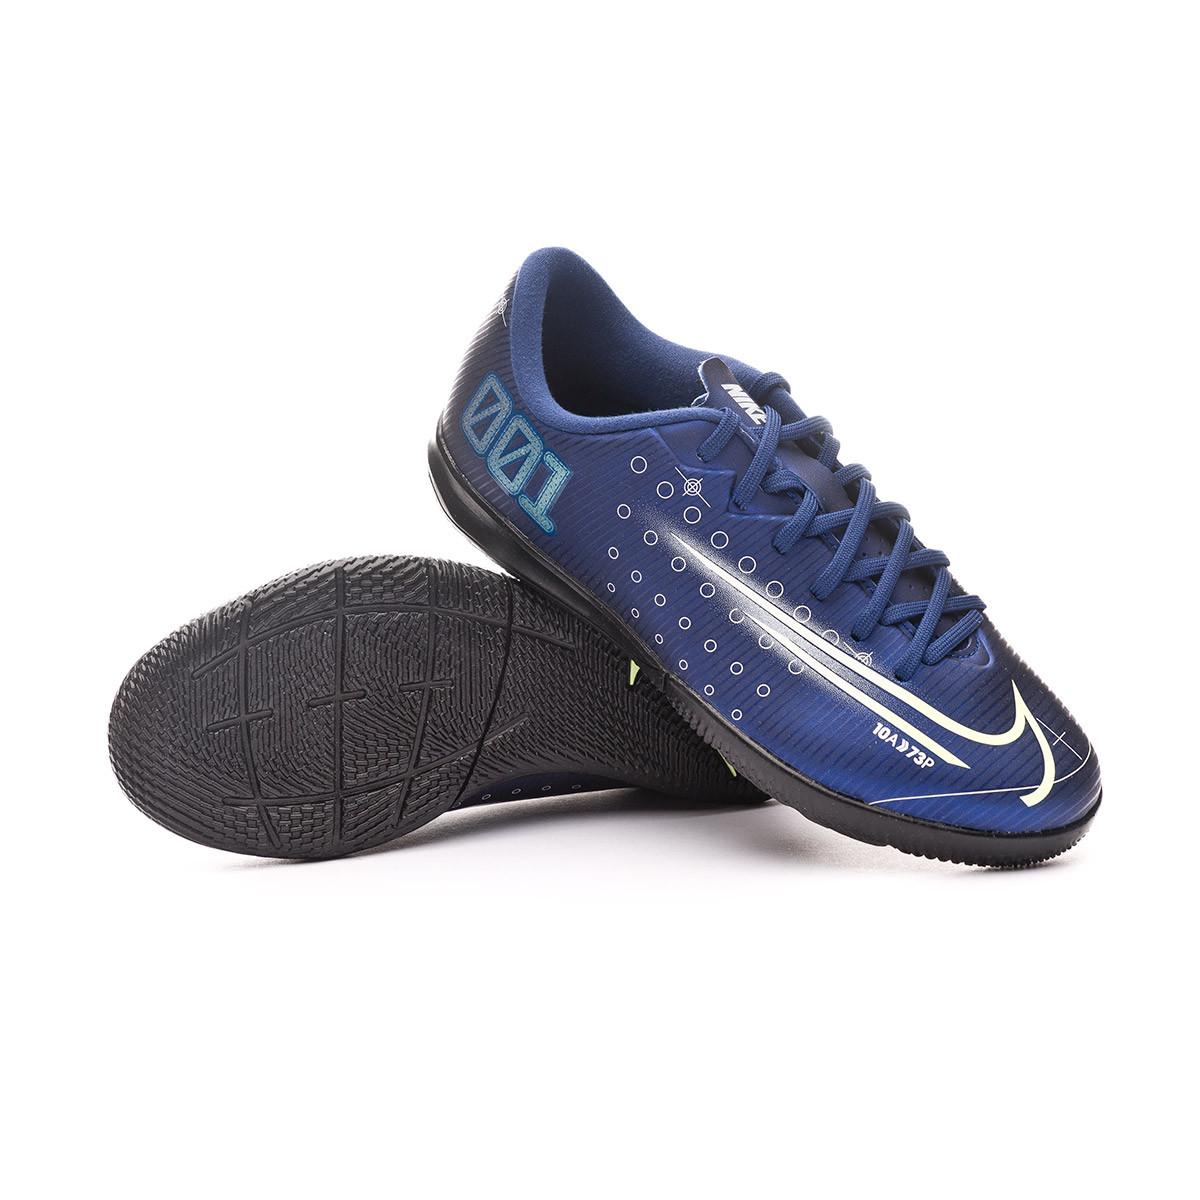 Sapatilha de Futsal Nike Mercurial Vapor XIII Academy MDS IC Criança